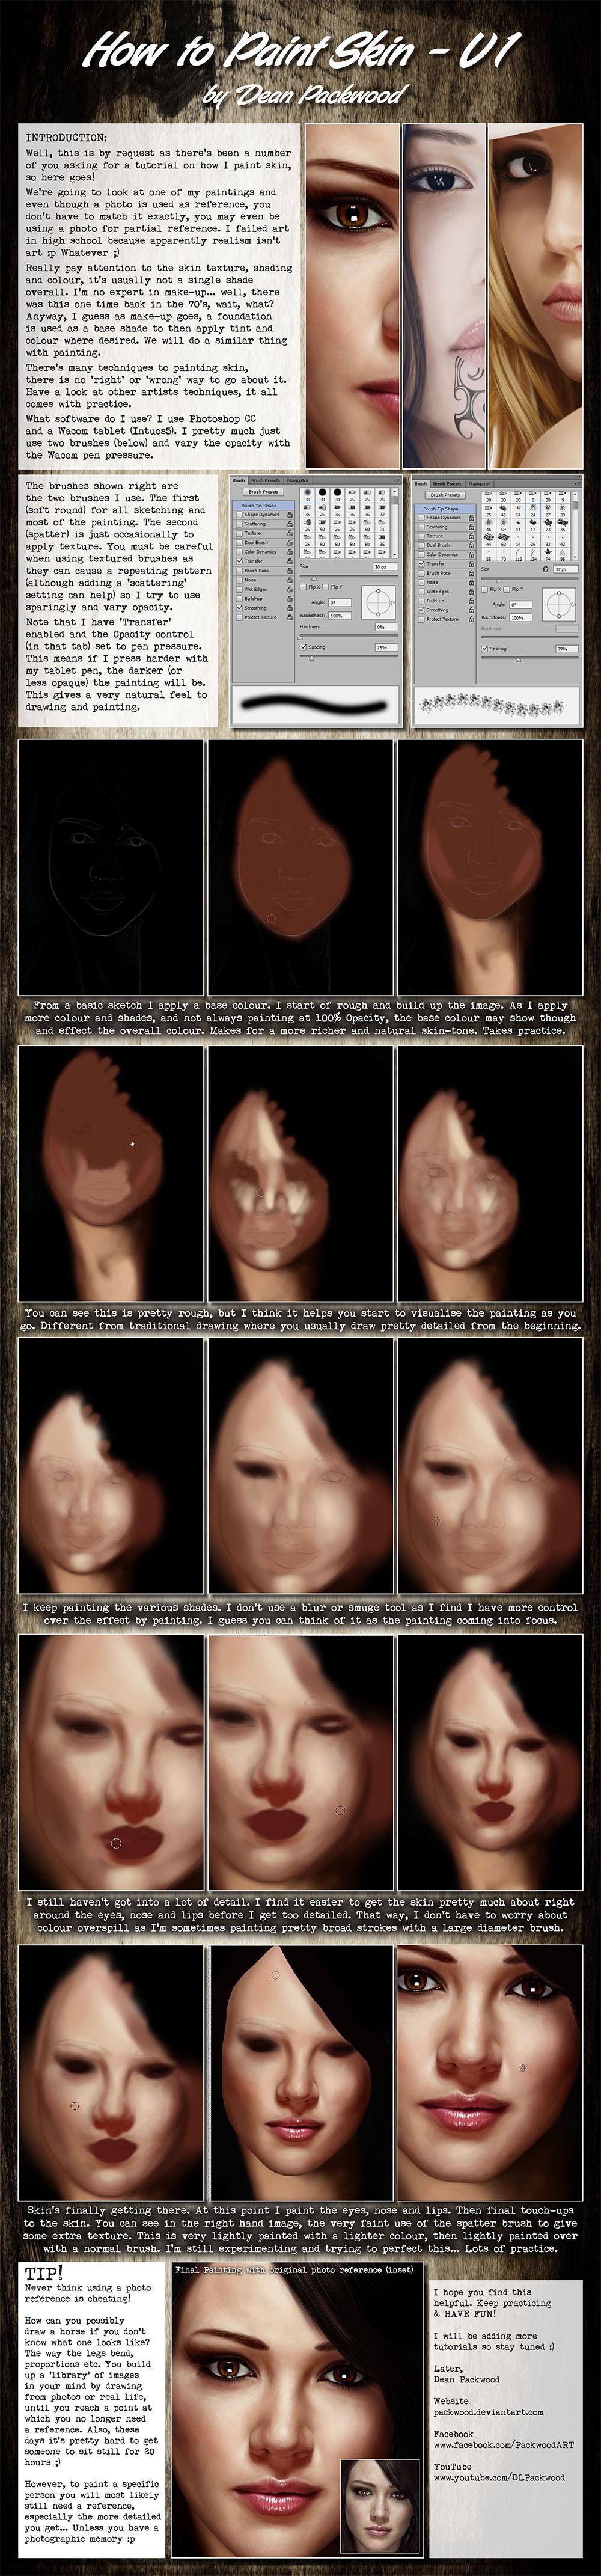 Skin Tutorial - V1